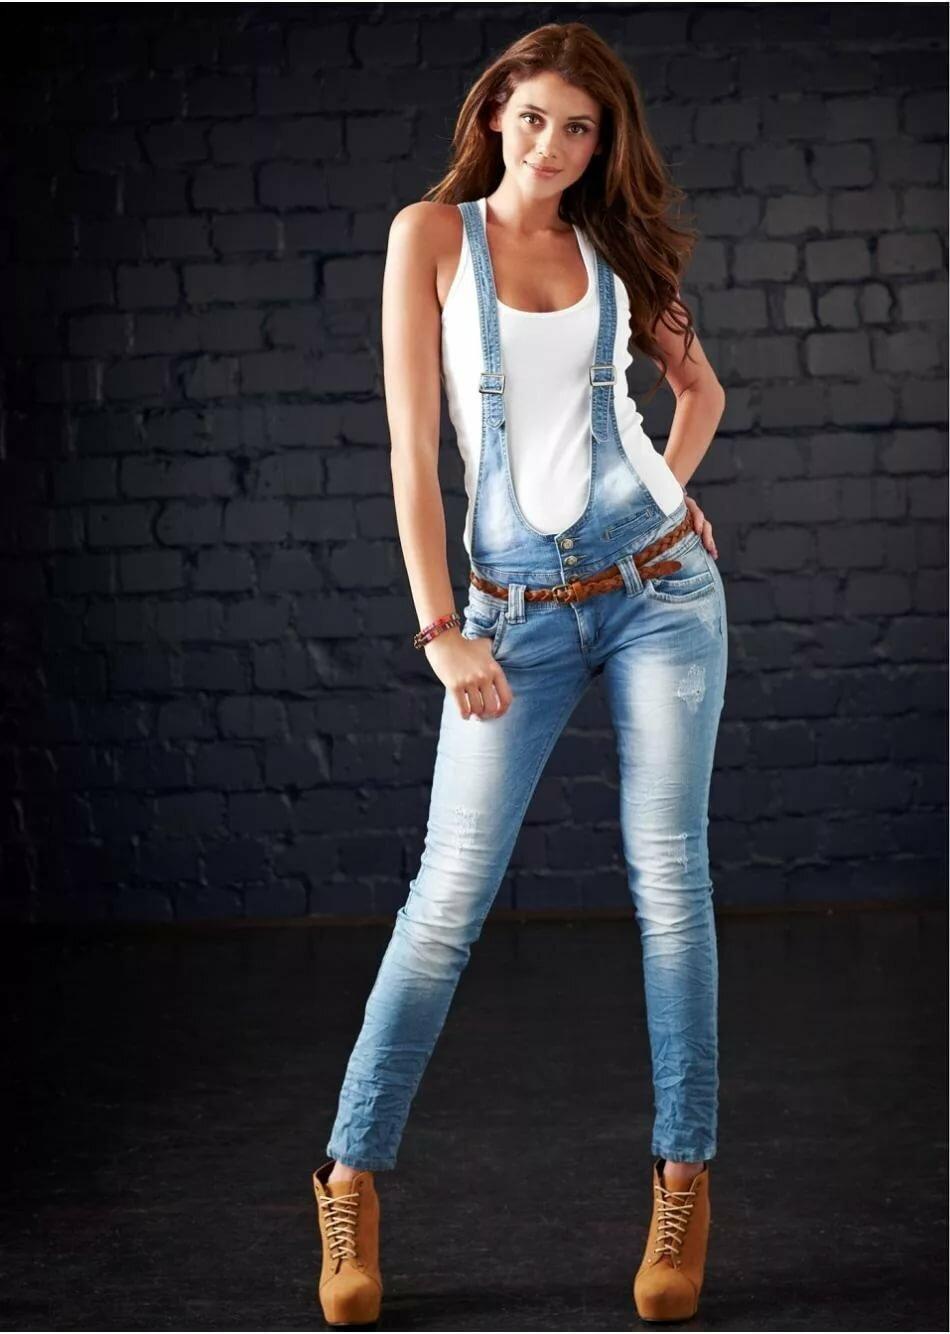 Картинки джинс на девушке